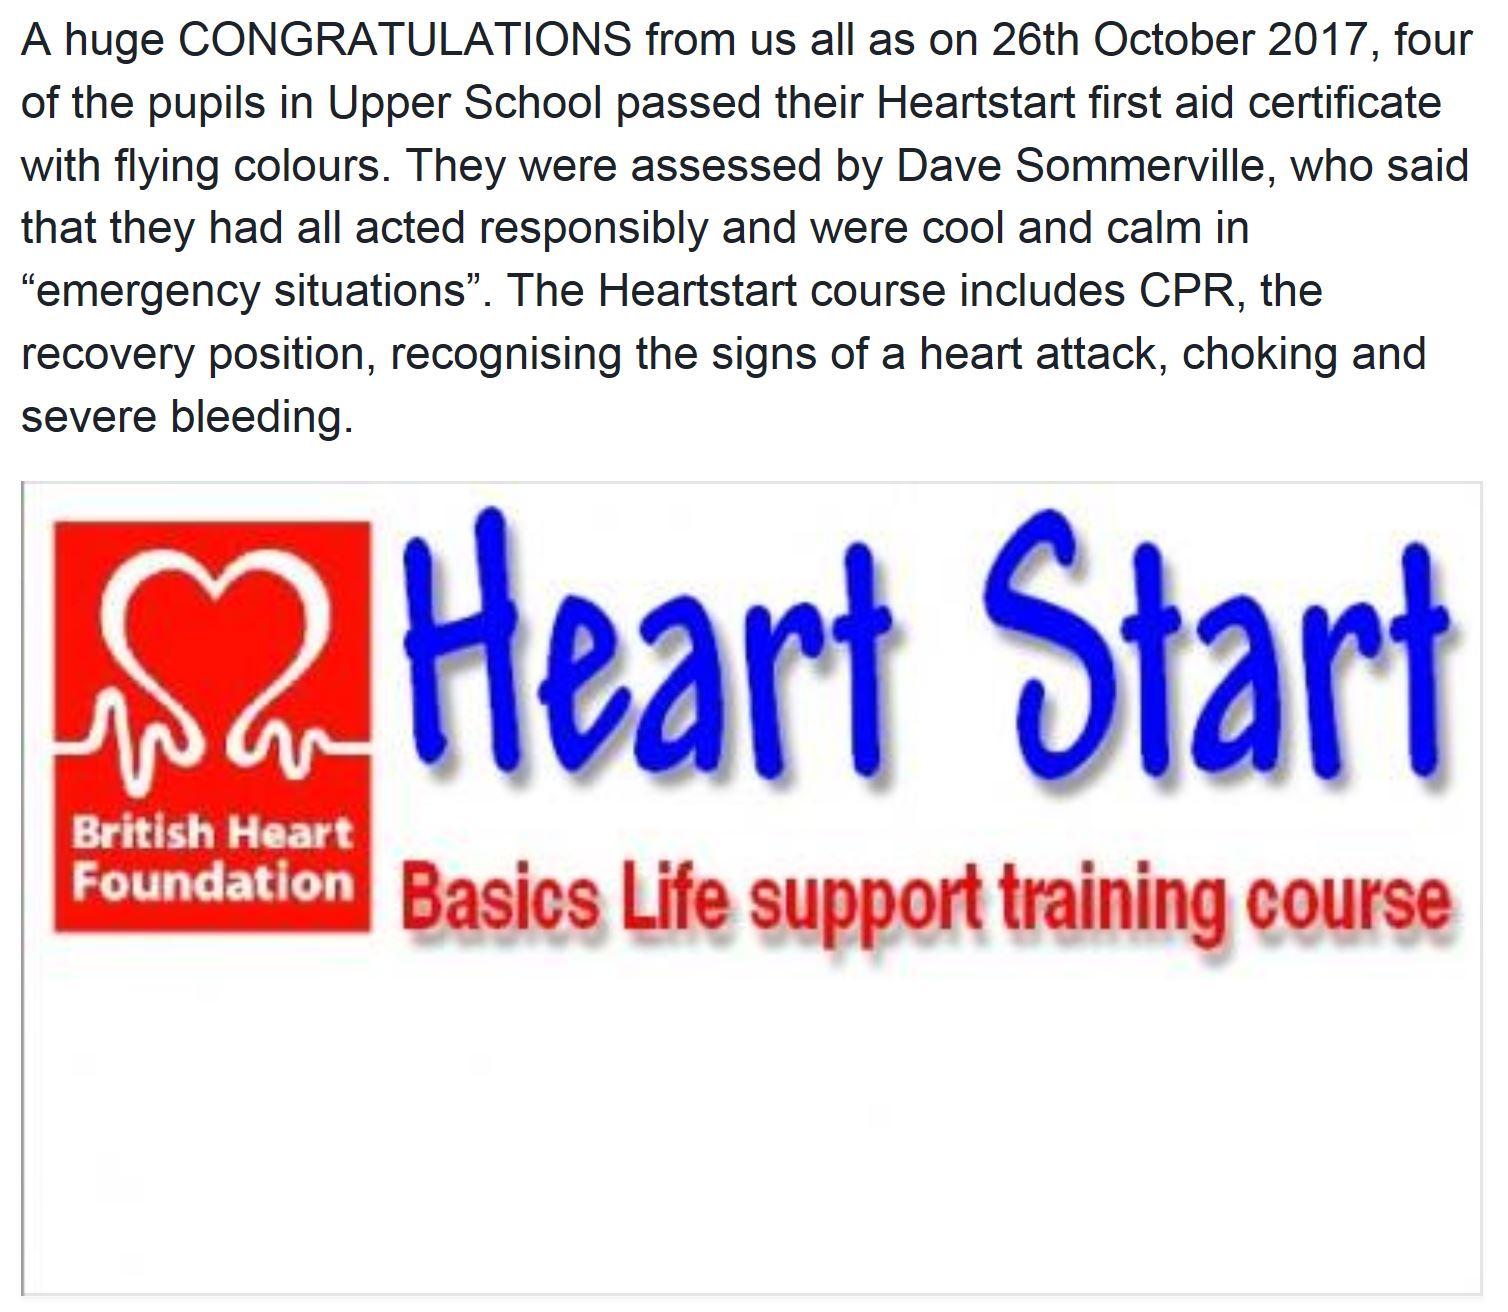 Heart Start